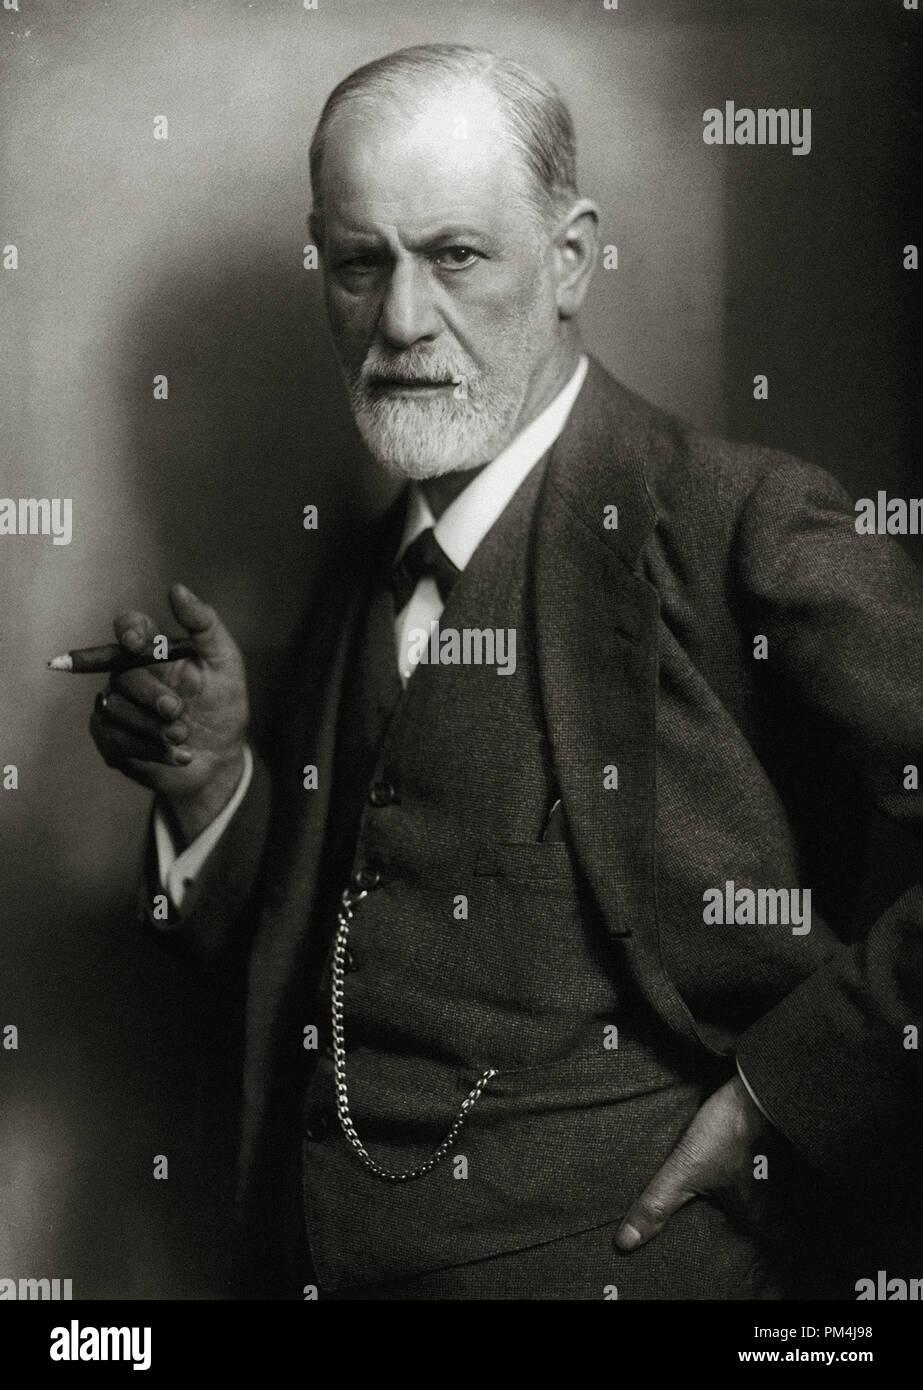 Sigmund Freud, founder of psychoanalysis, smoking cigar, 1922  Photo by Max Halberstadt  File Reference # 1003_615THA - Stock Image